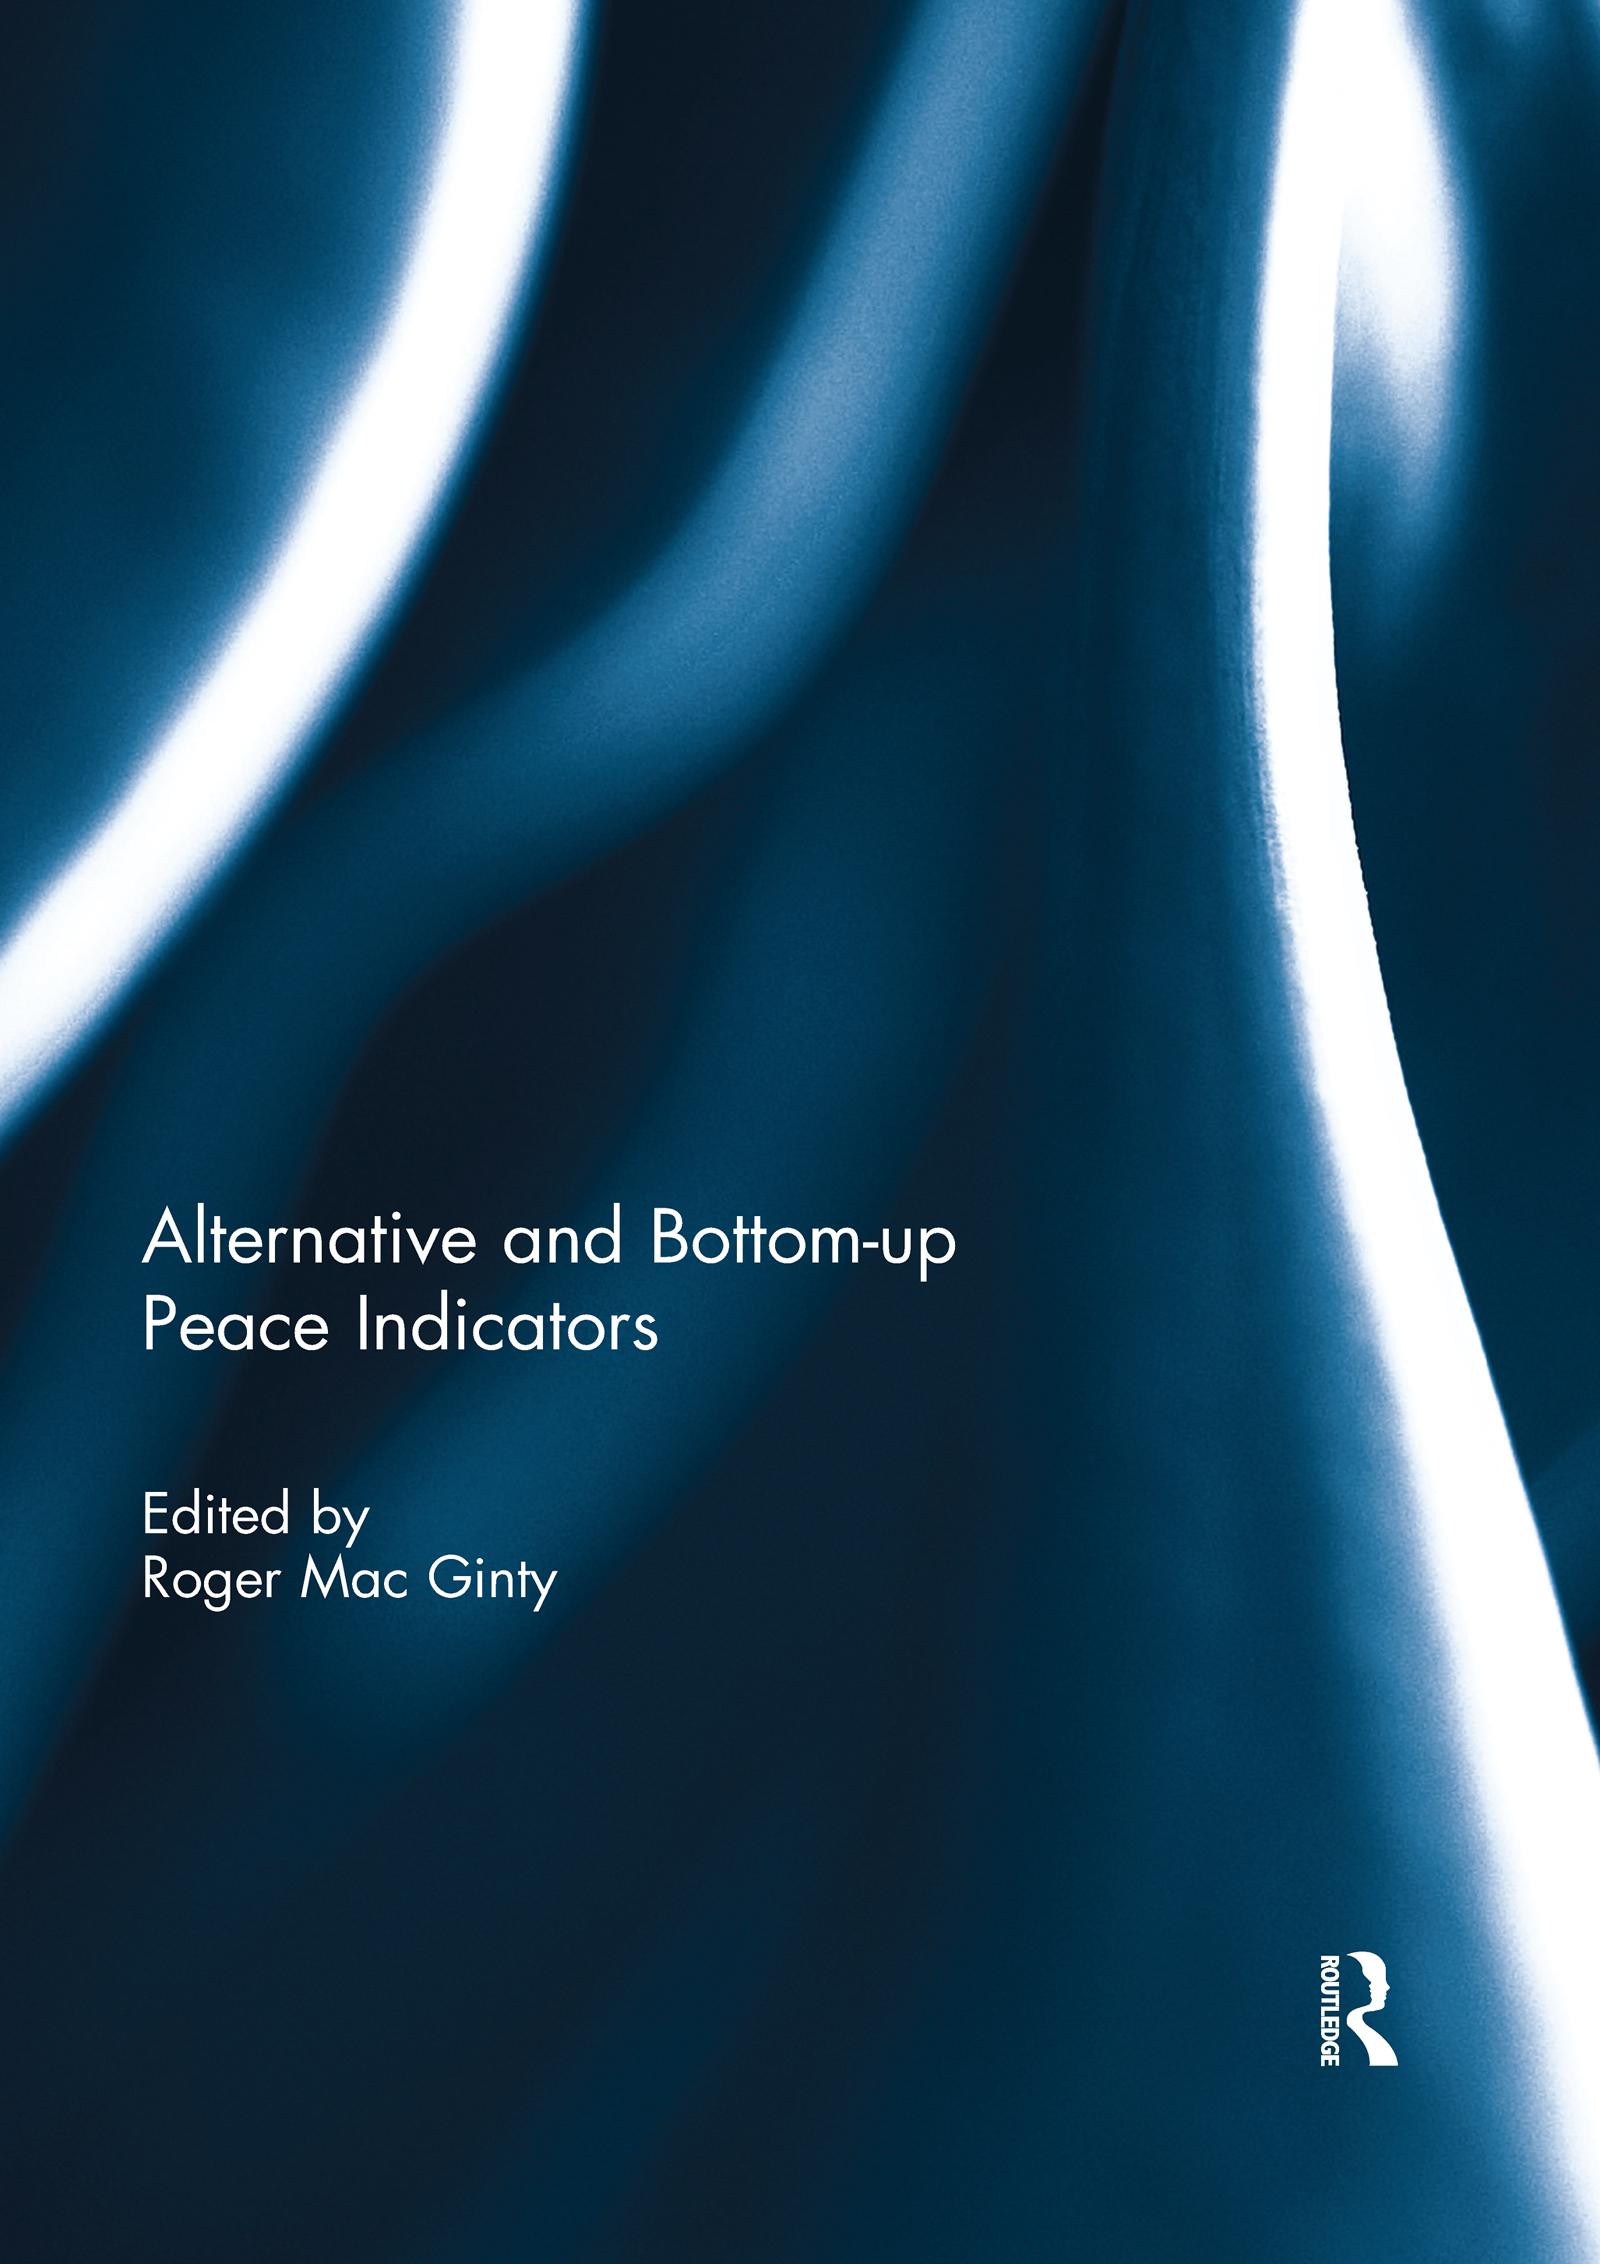 Alternative and bottom-up peace indicators